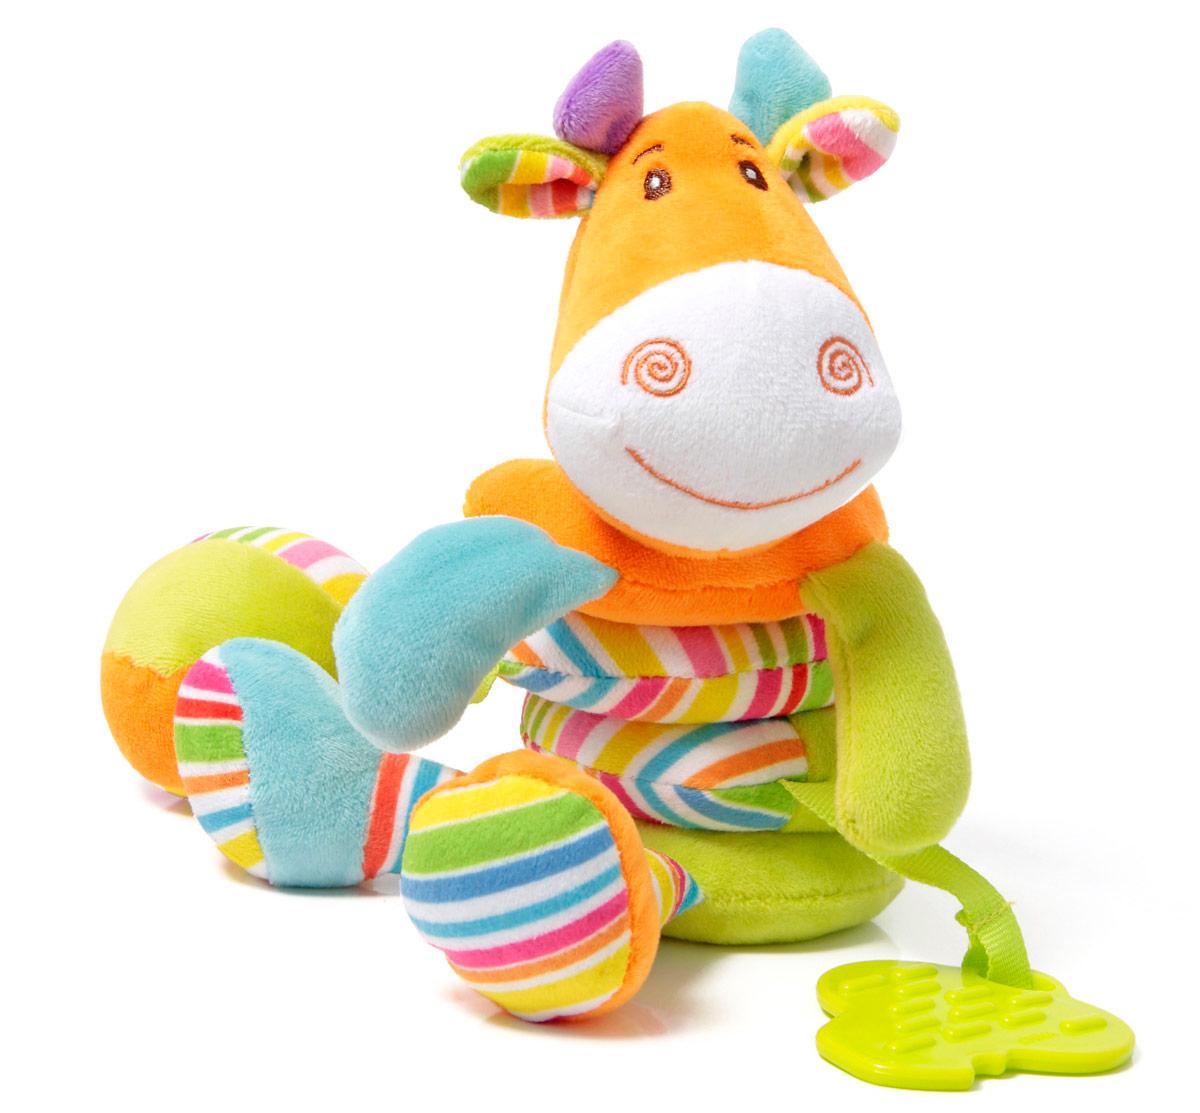 Ути-Пути Развивающая игрушка Жираф игрушка shantou daxiang 1304f445